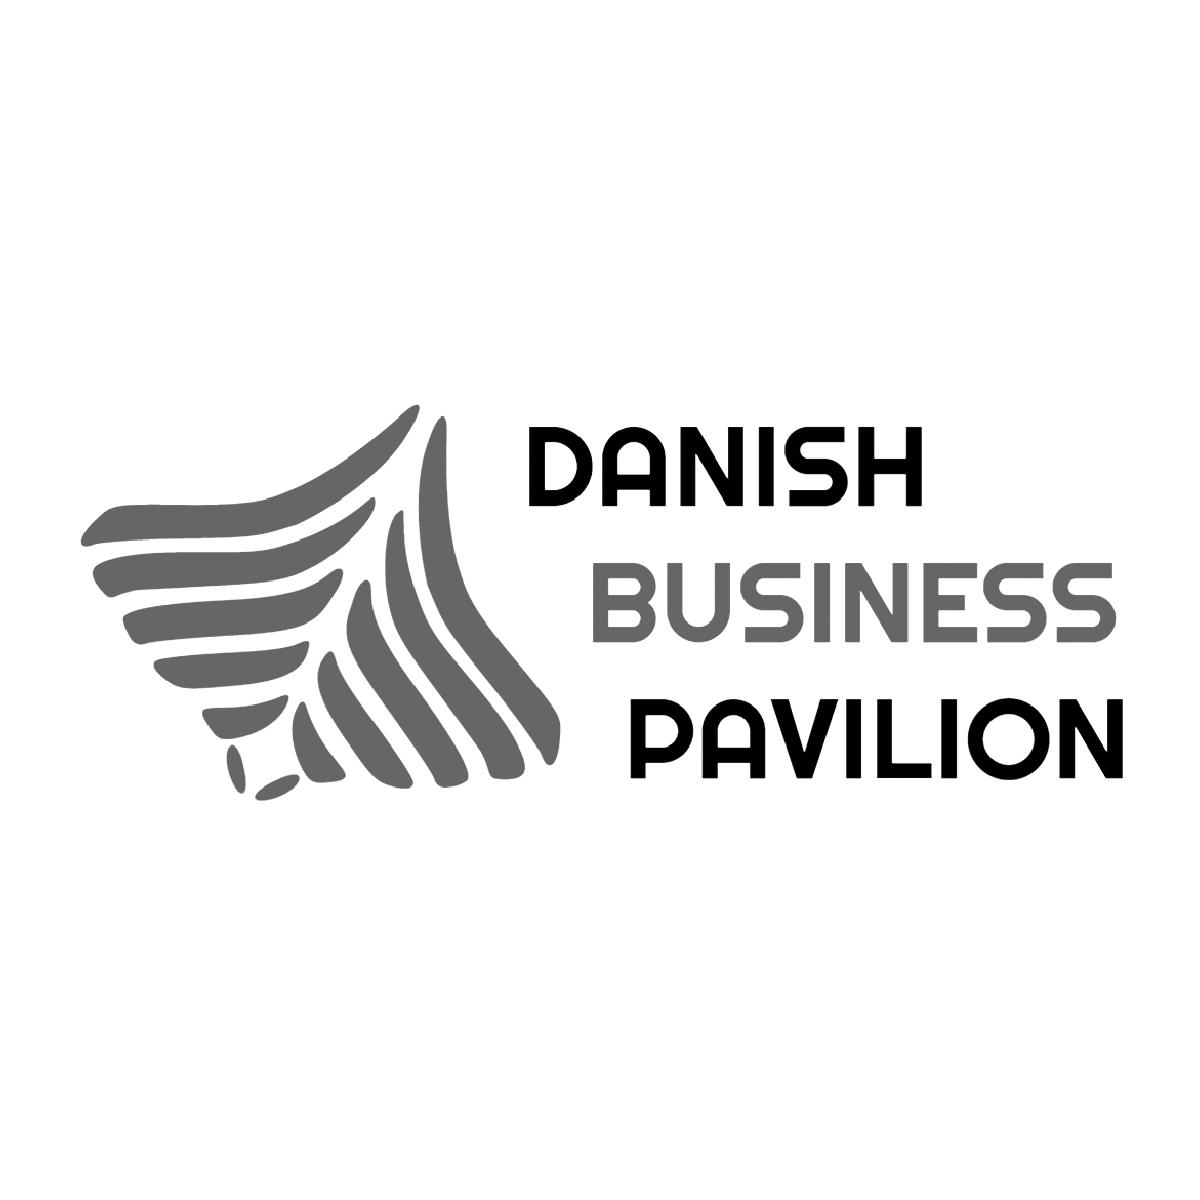 Danish Business Pavilion Expo 2020 Dubai